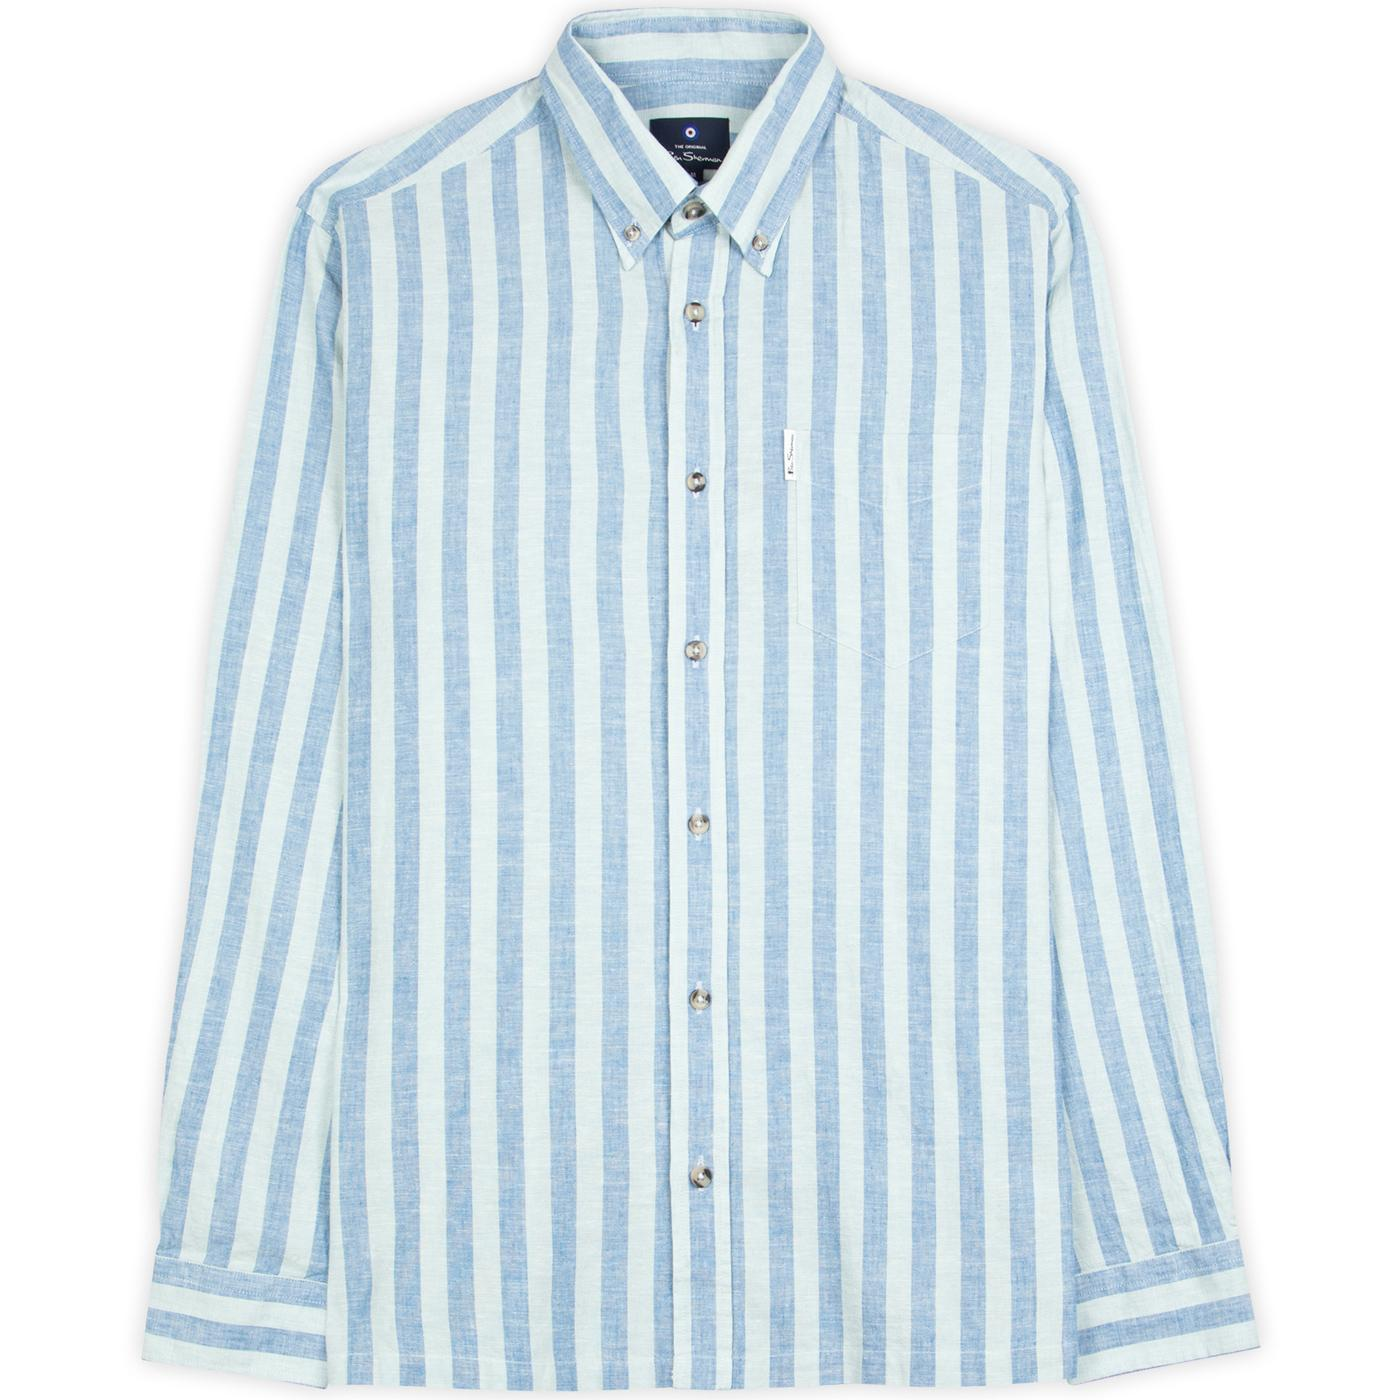 BEN SHERMAN 60s Mod Linen Jagger Stripe Shirt (LG)